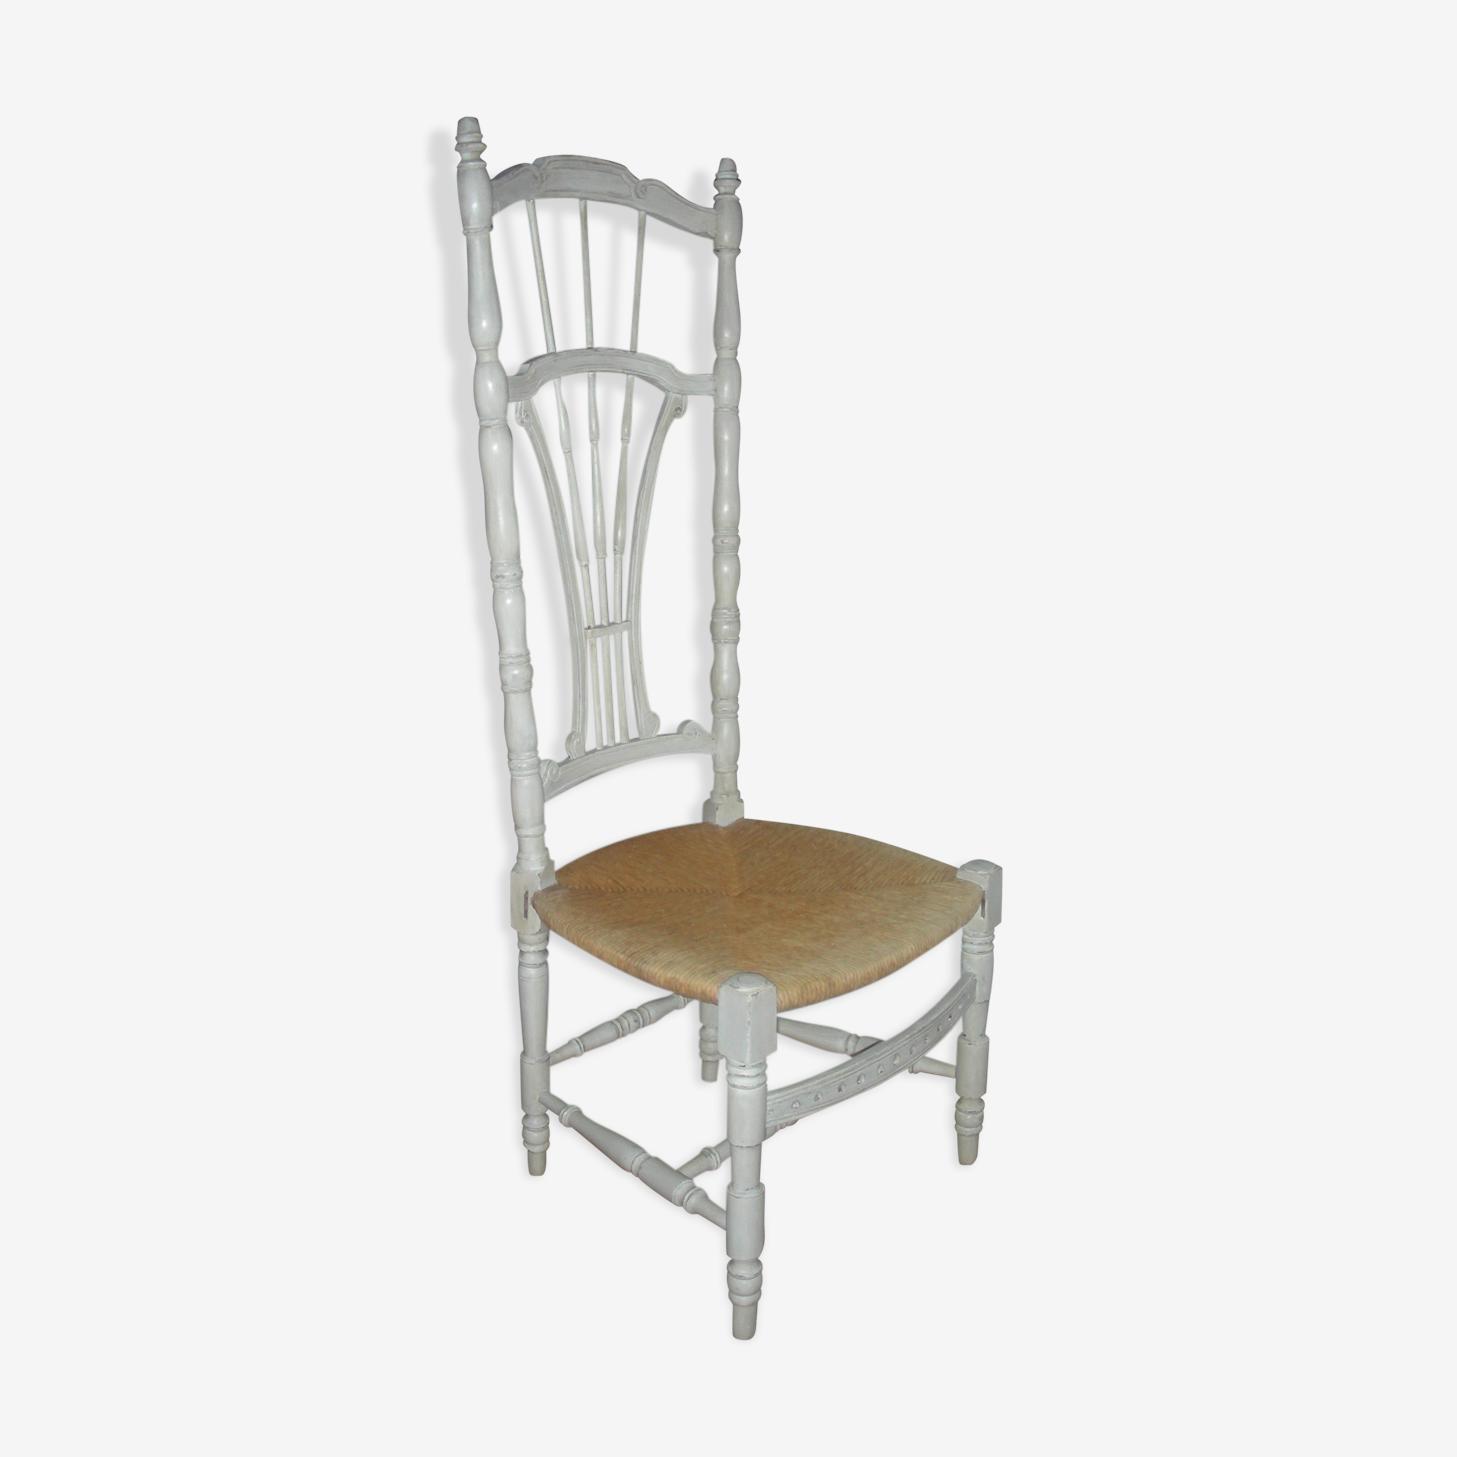 Chaise prie-dieu patinée style shabby